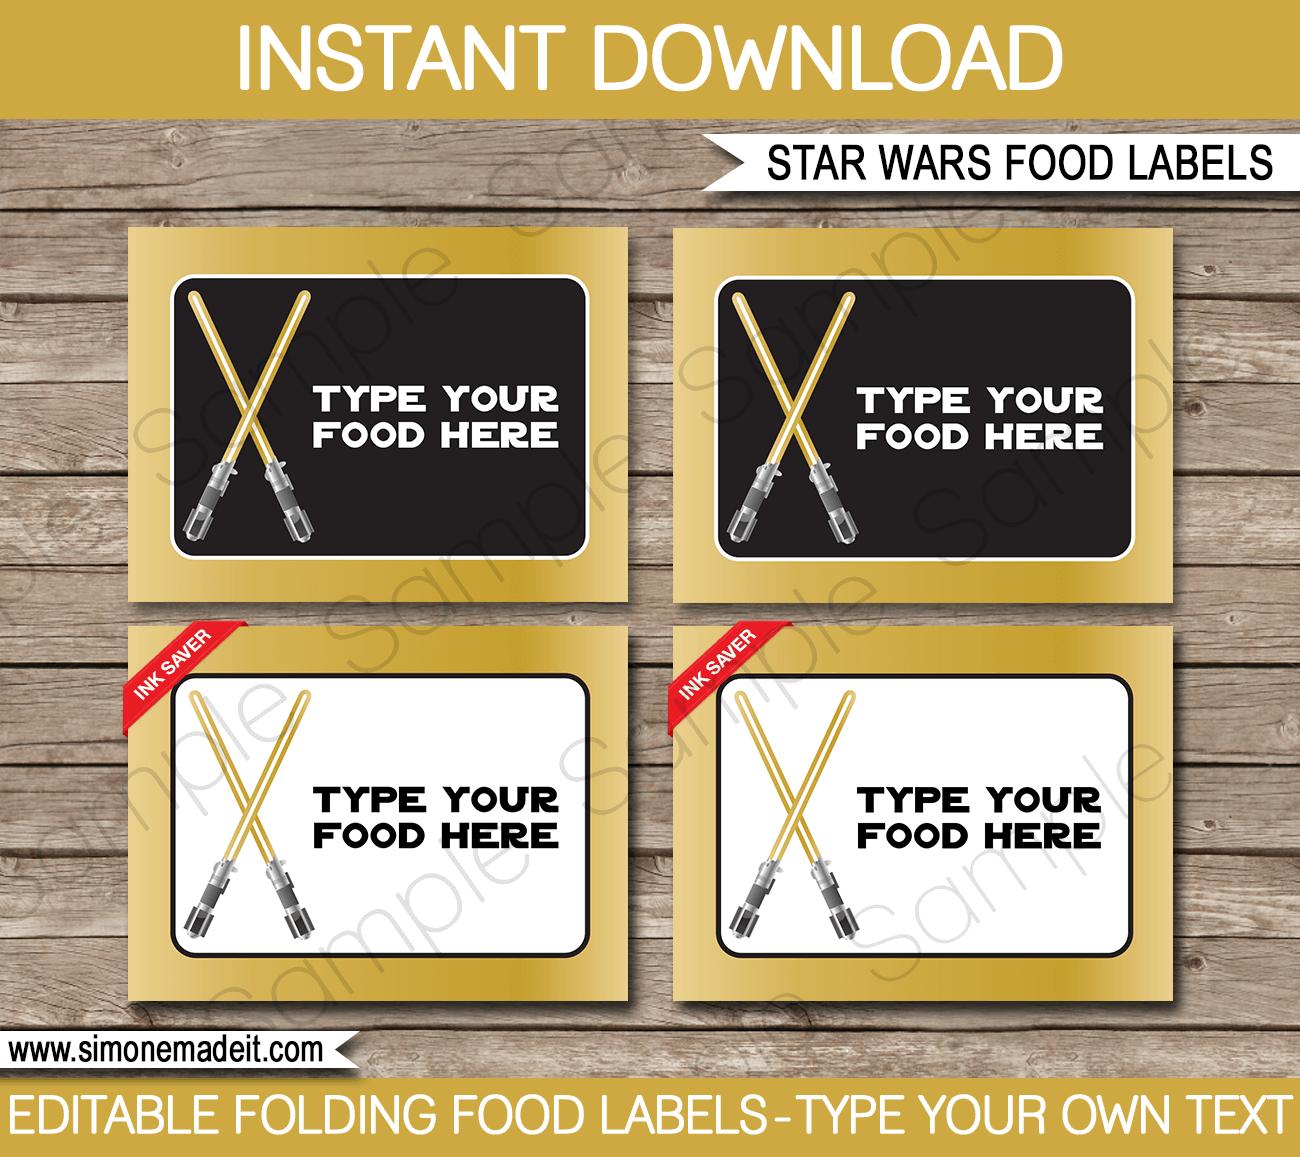 Star Wars Food Labels Editable